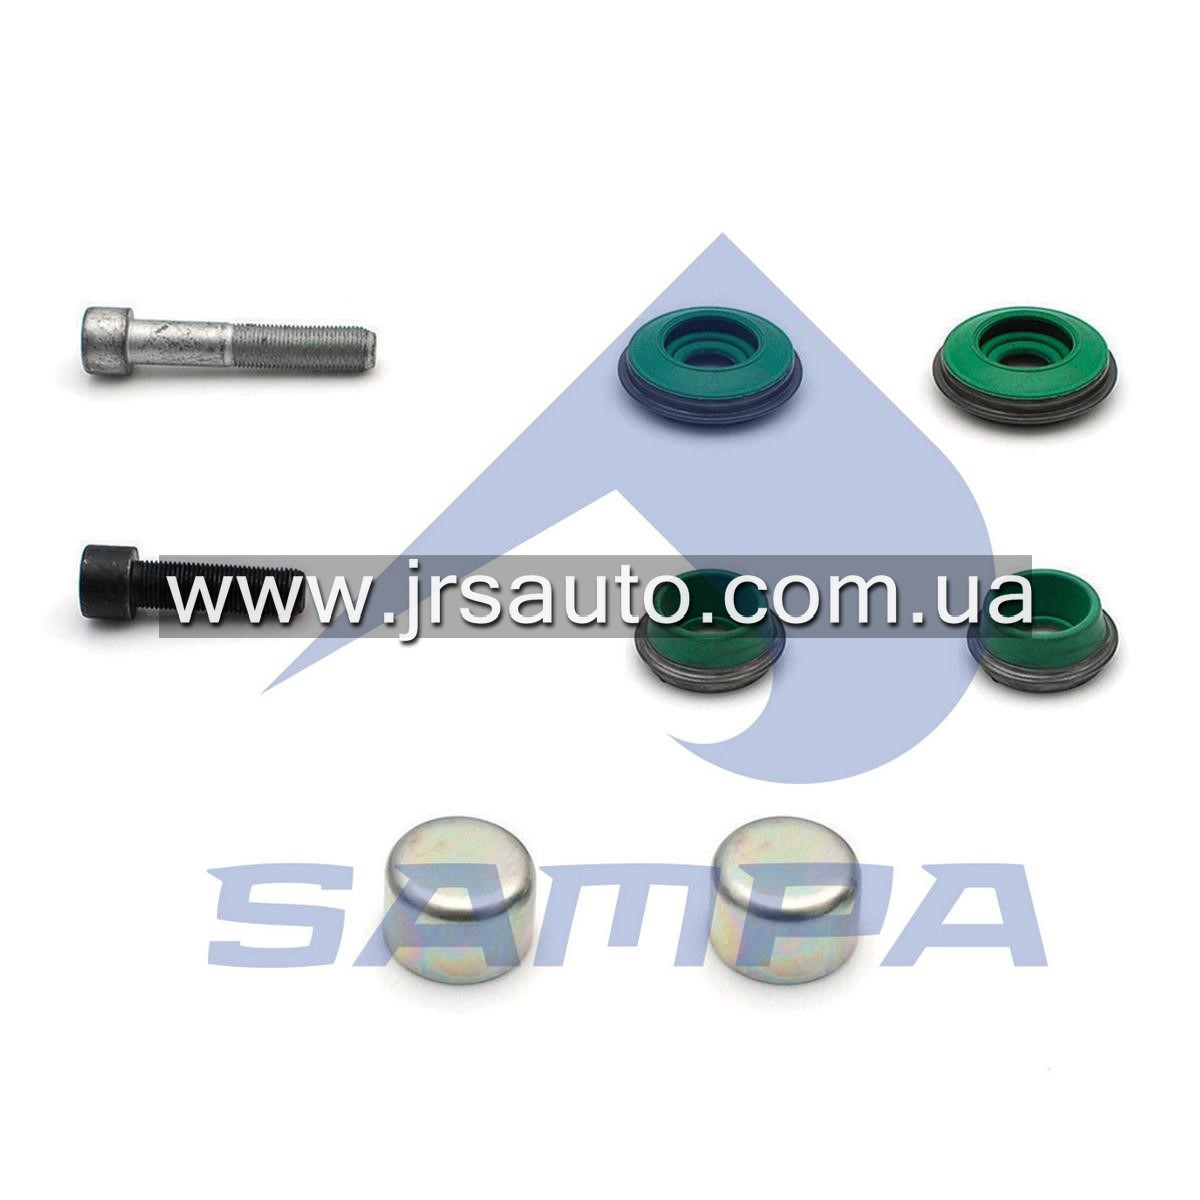 Ремкомплект суппорта ROR \MCK1192 \ 095.516